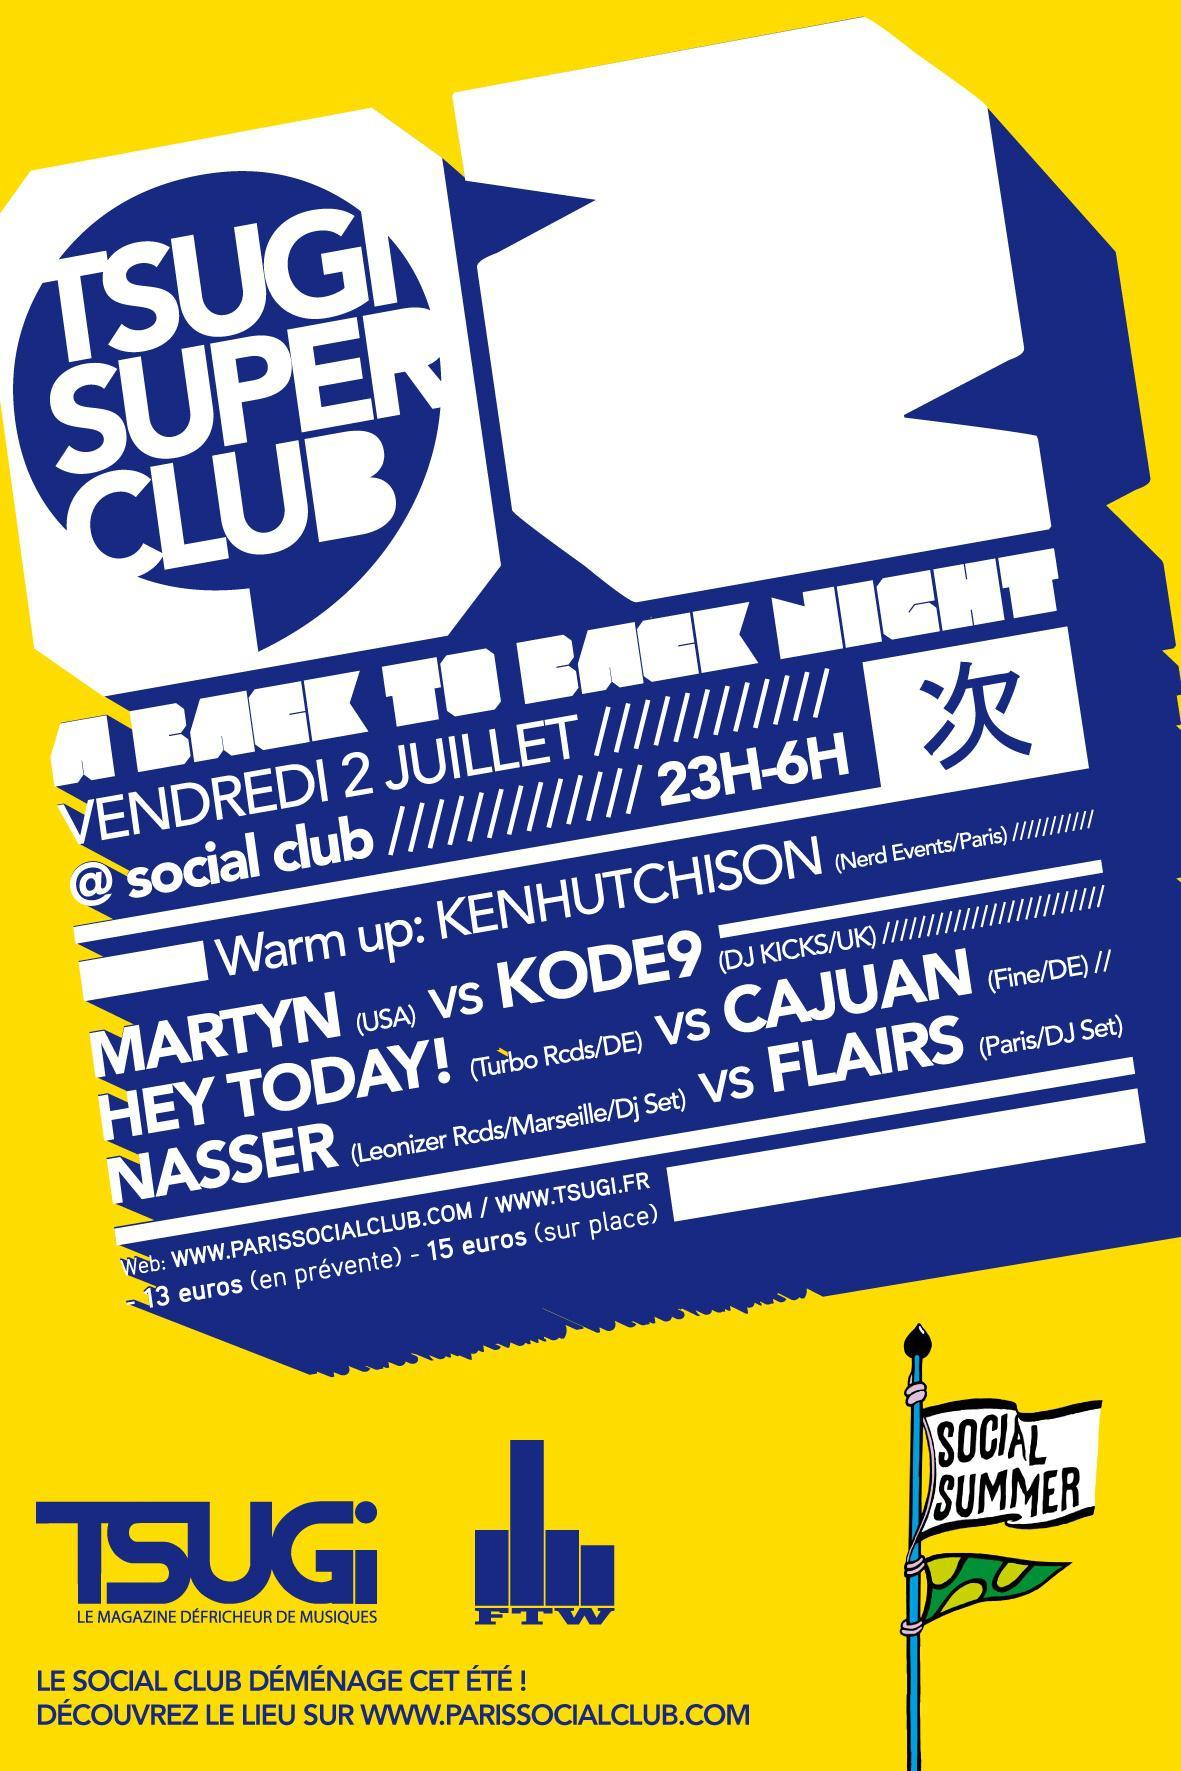 Social Summer - Tsugi Superclub - Bon Appétit